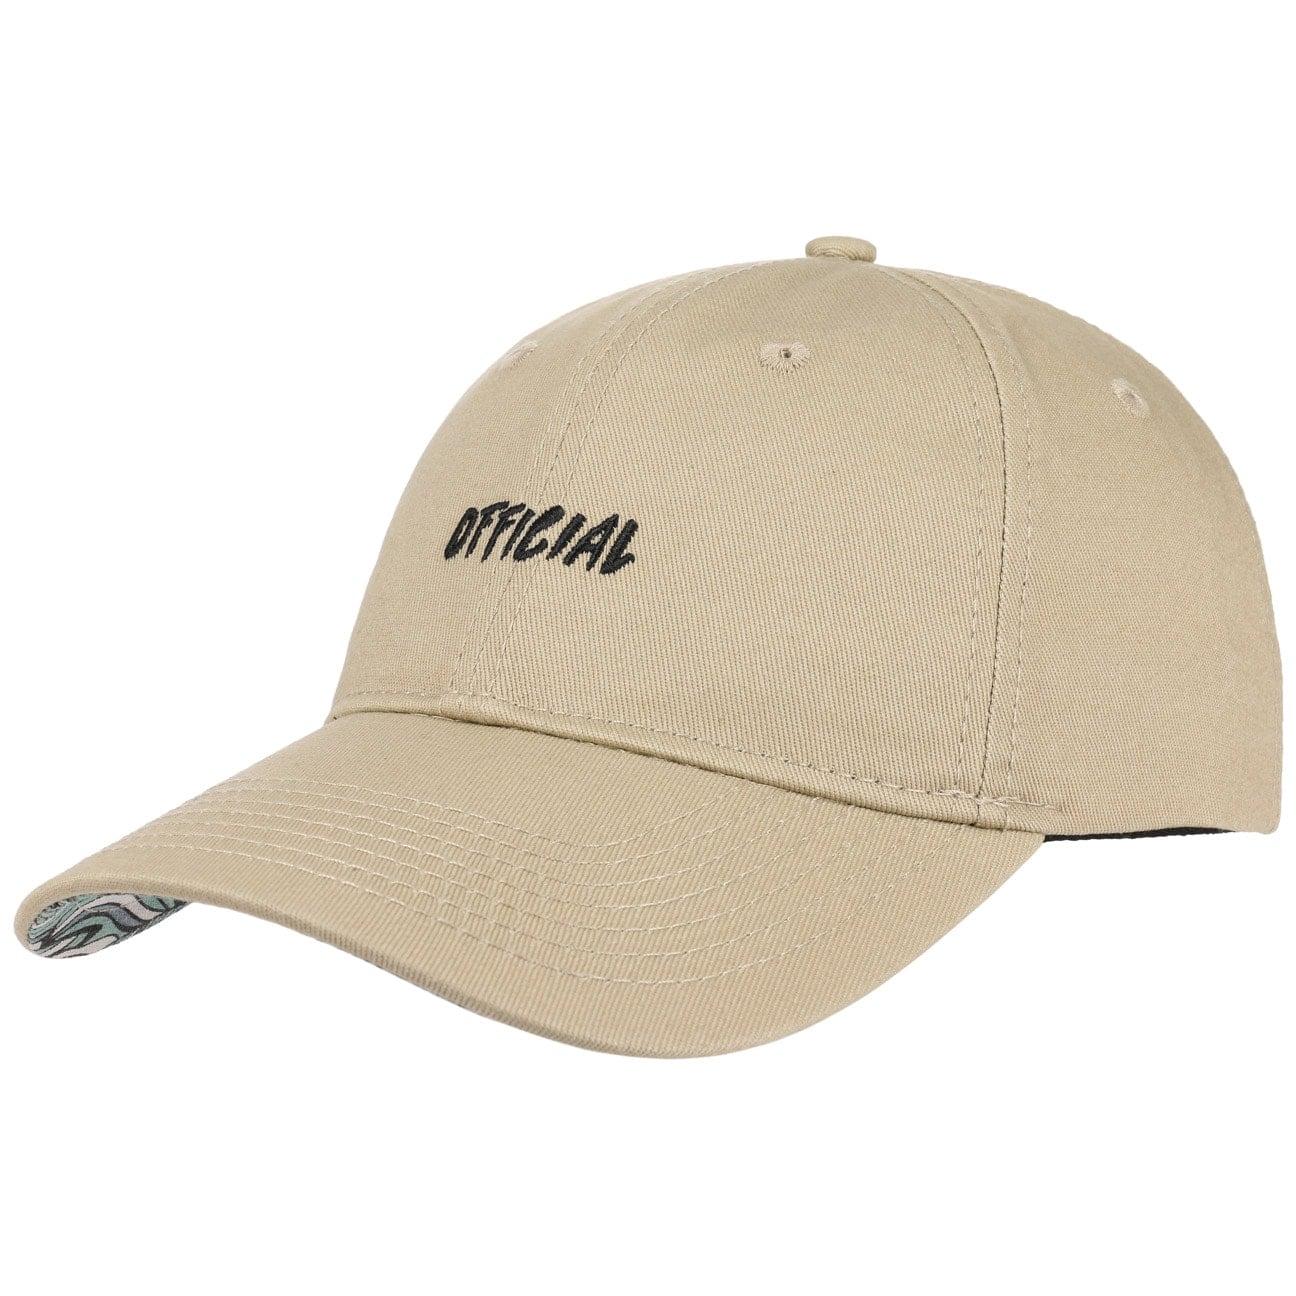 Gorra Artisan Uni Strapback by Official Headwear  gorra de baseball